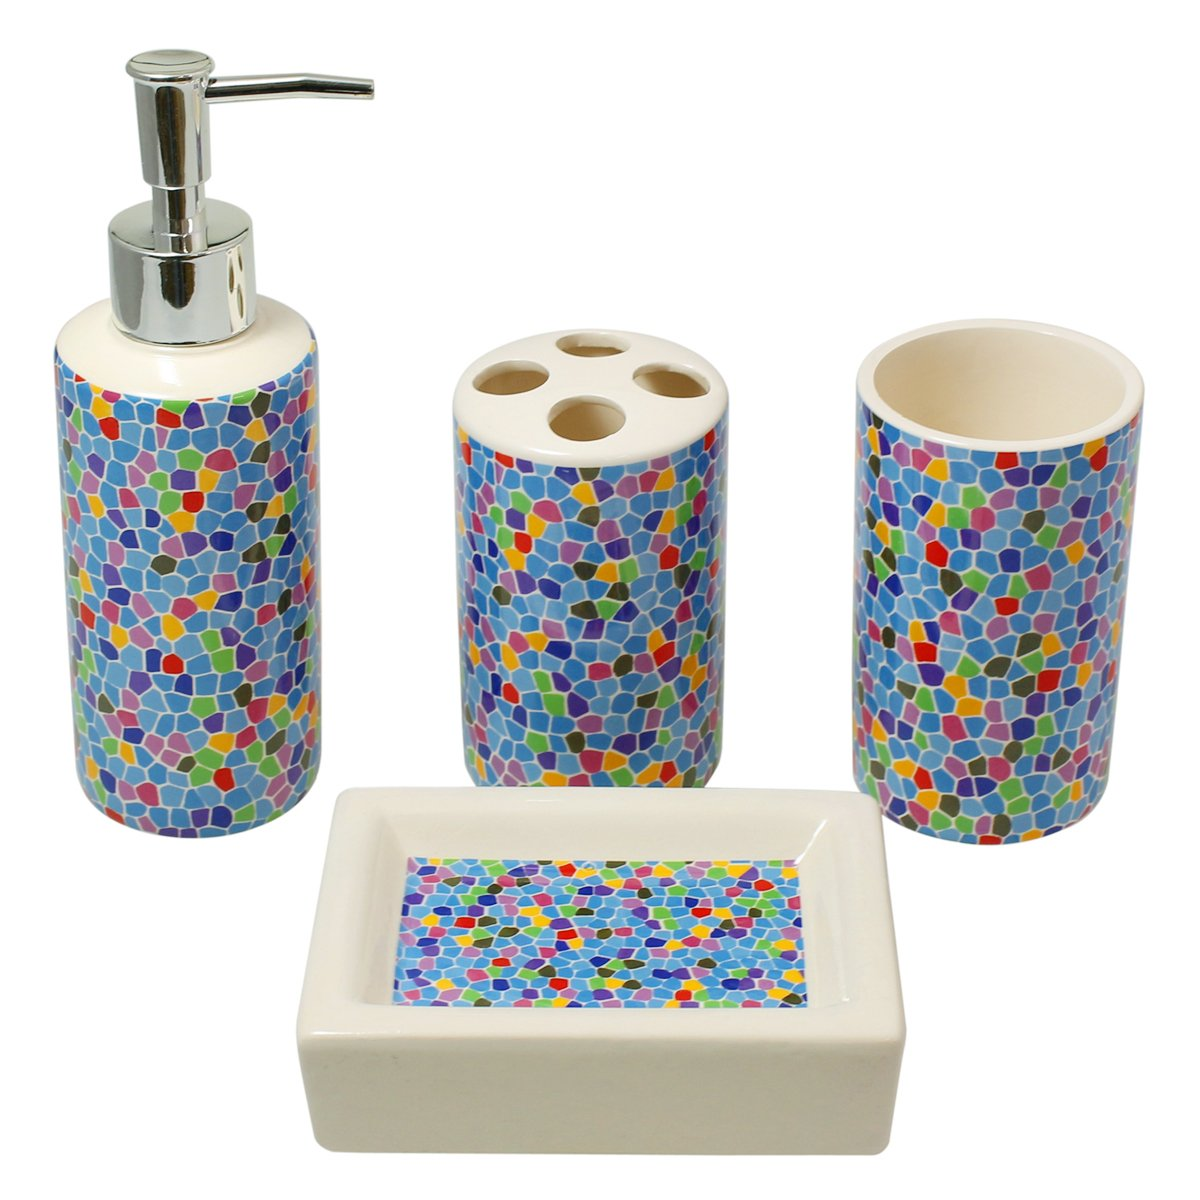 Amazon.com: 4-Piece Ceramic Bathroom Accessory Set - Blue Scatter ...